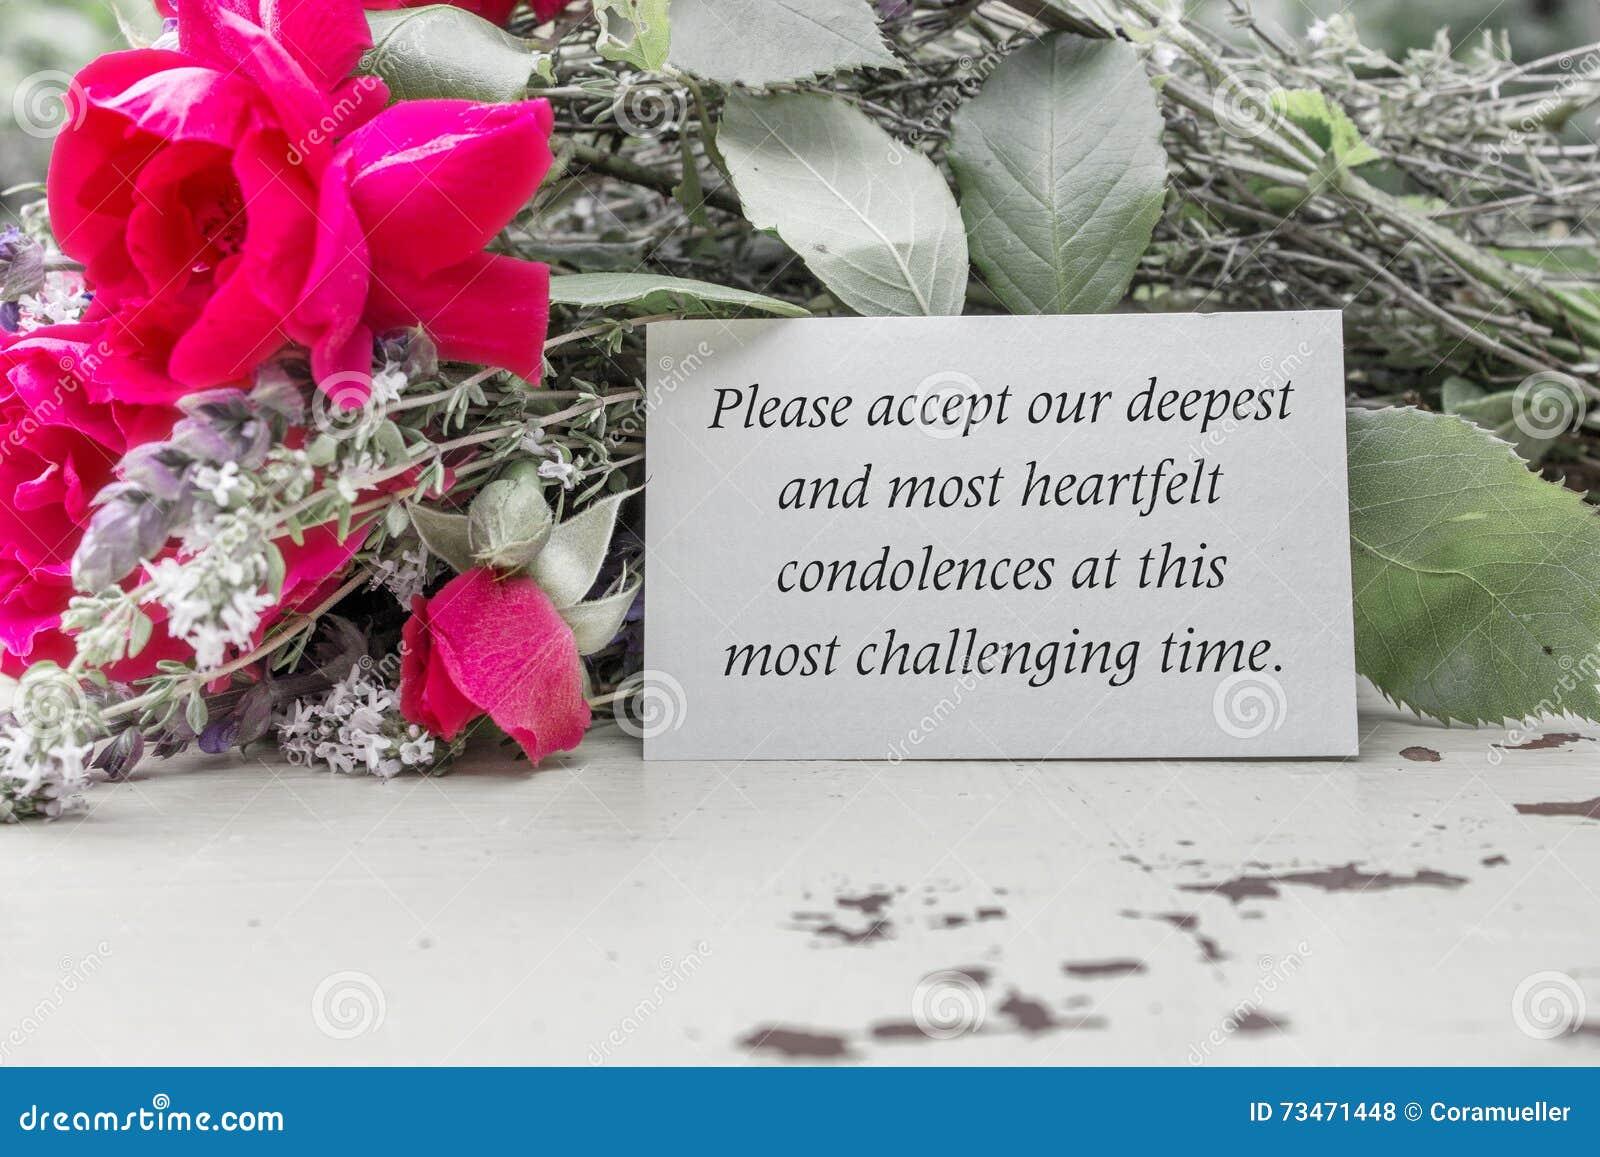 how to send a condolence text